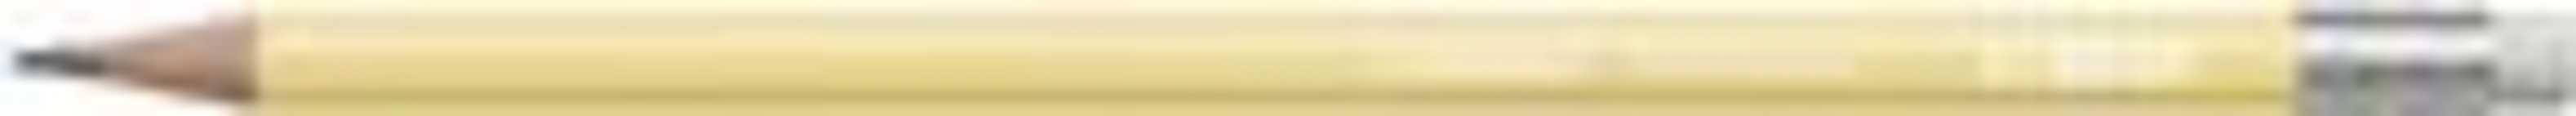 Stabilo potlood Swano pastel, geel, met gom